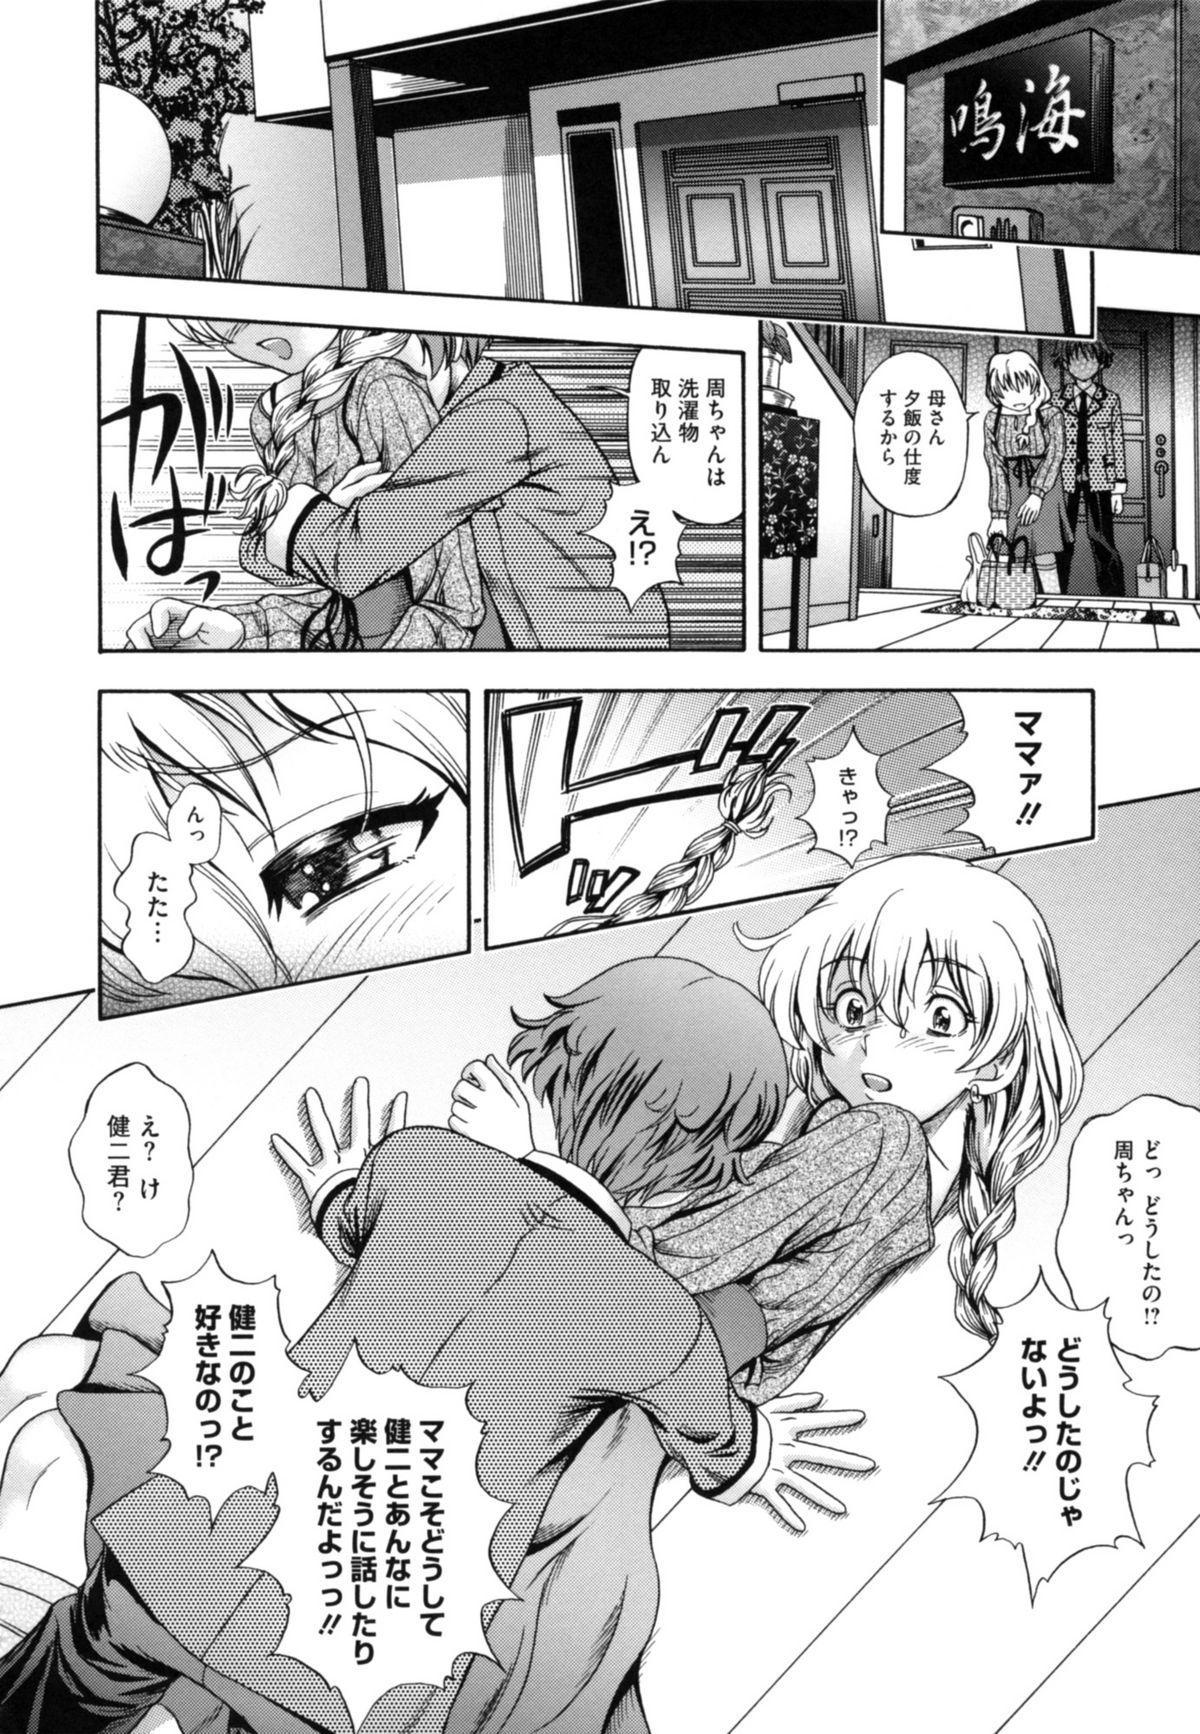 Soushisouai Note Nisatsume 217